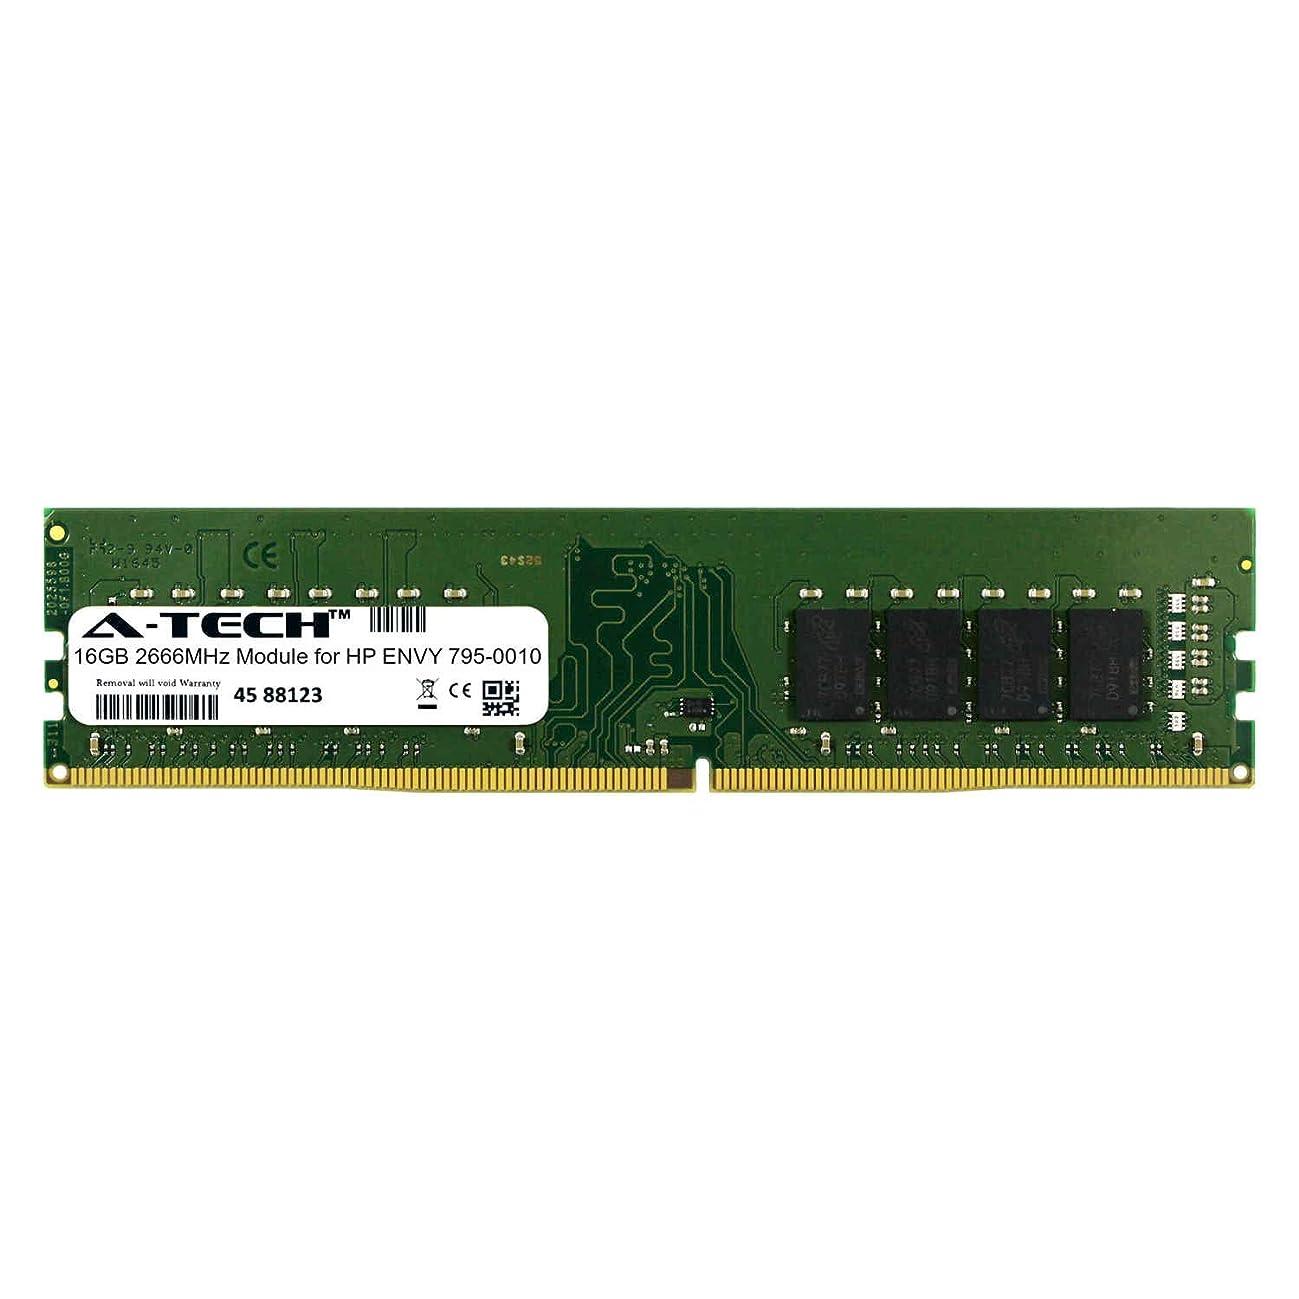 A-Tech 16GB Module for HP Envy 795-0010 Desktop & Workstation Motherboard Compatible DDR4 2666Mhz Memory Ram (ATMS274151A25823X1)